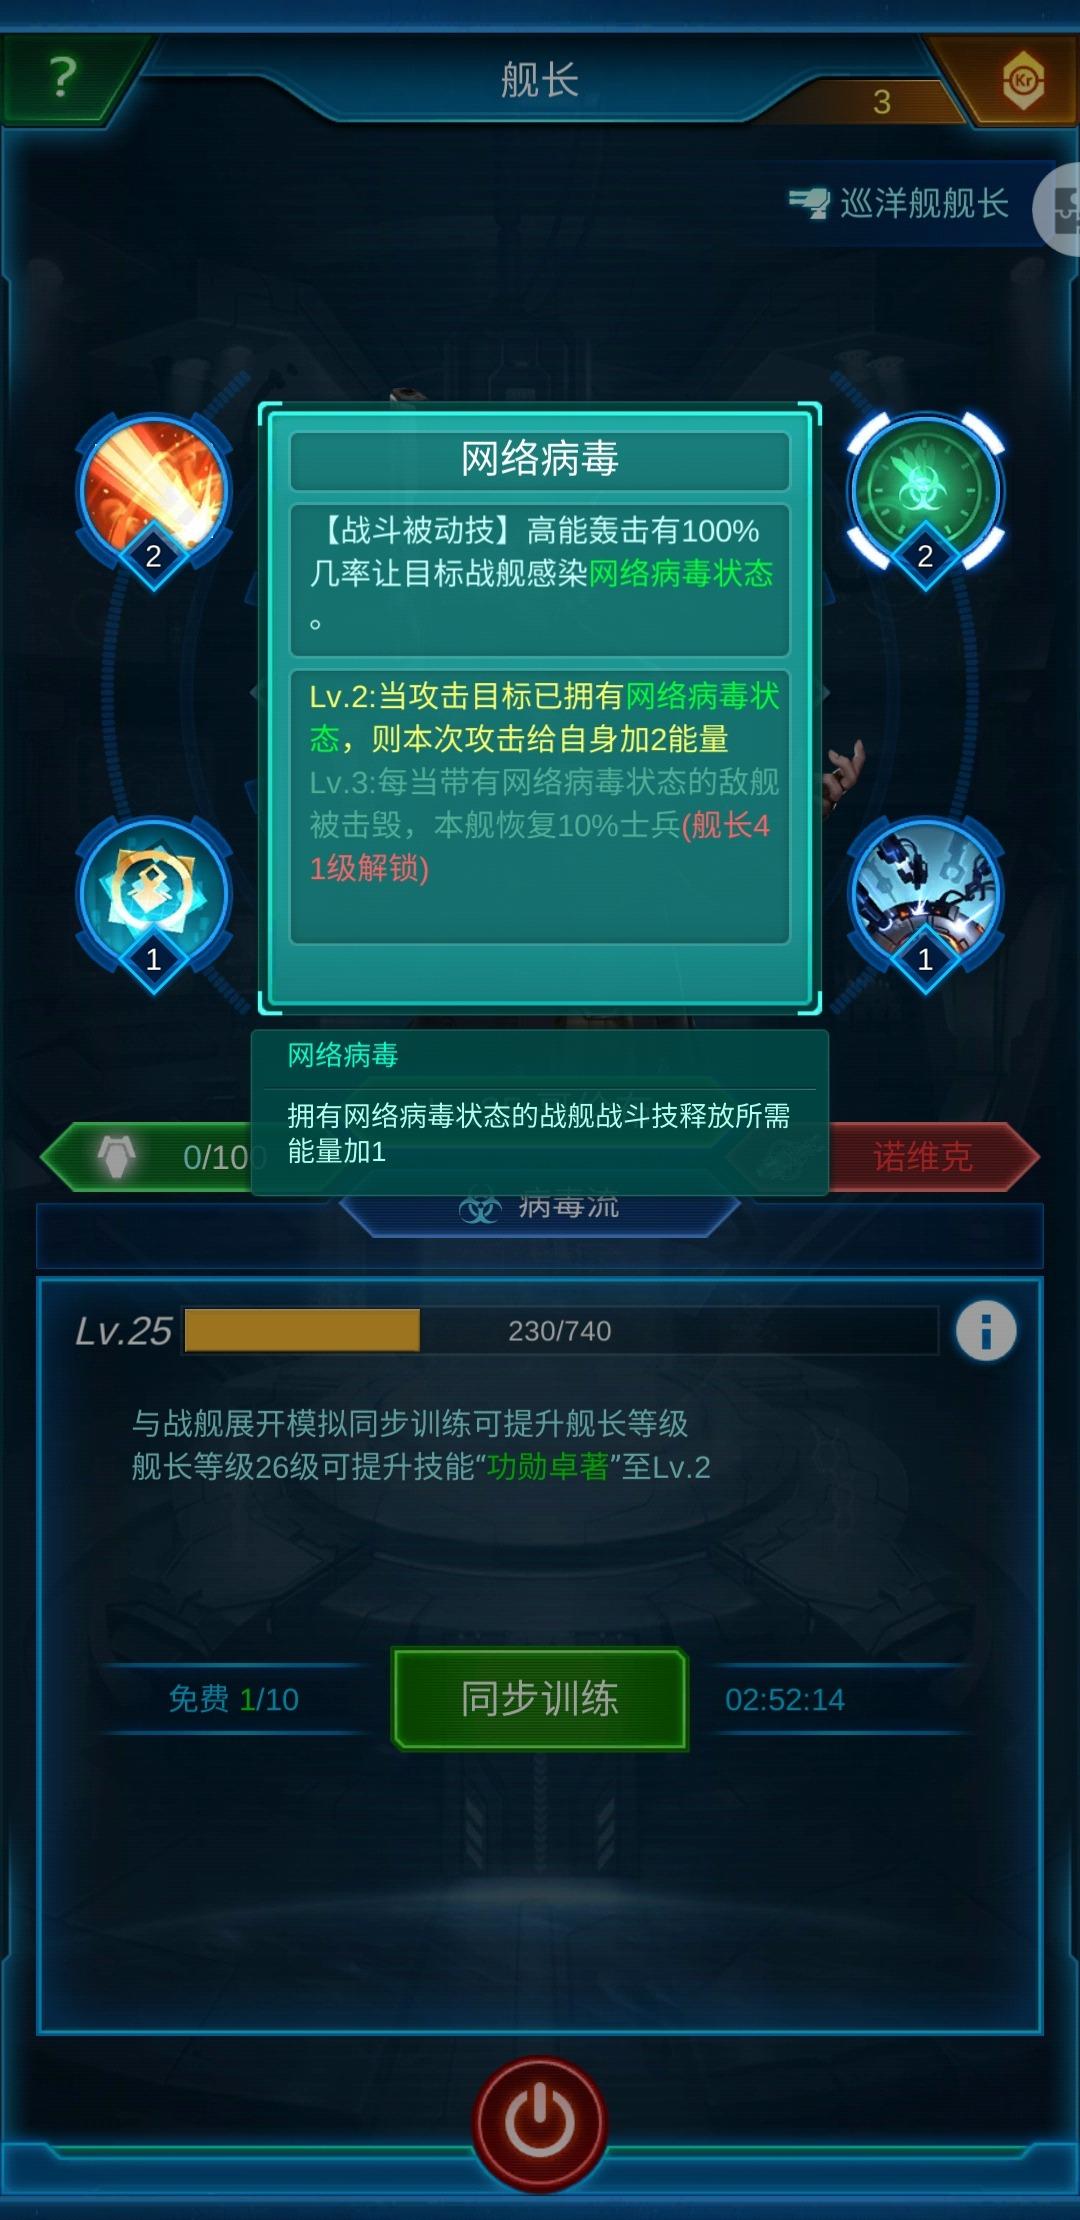 Screenshot_20200417_051549_com.jedigames.p16s.huawei.jpg